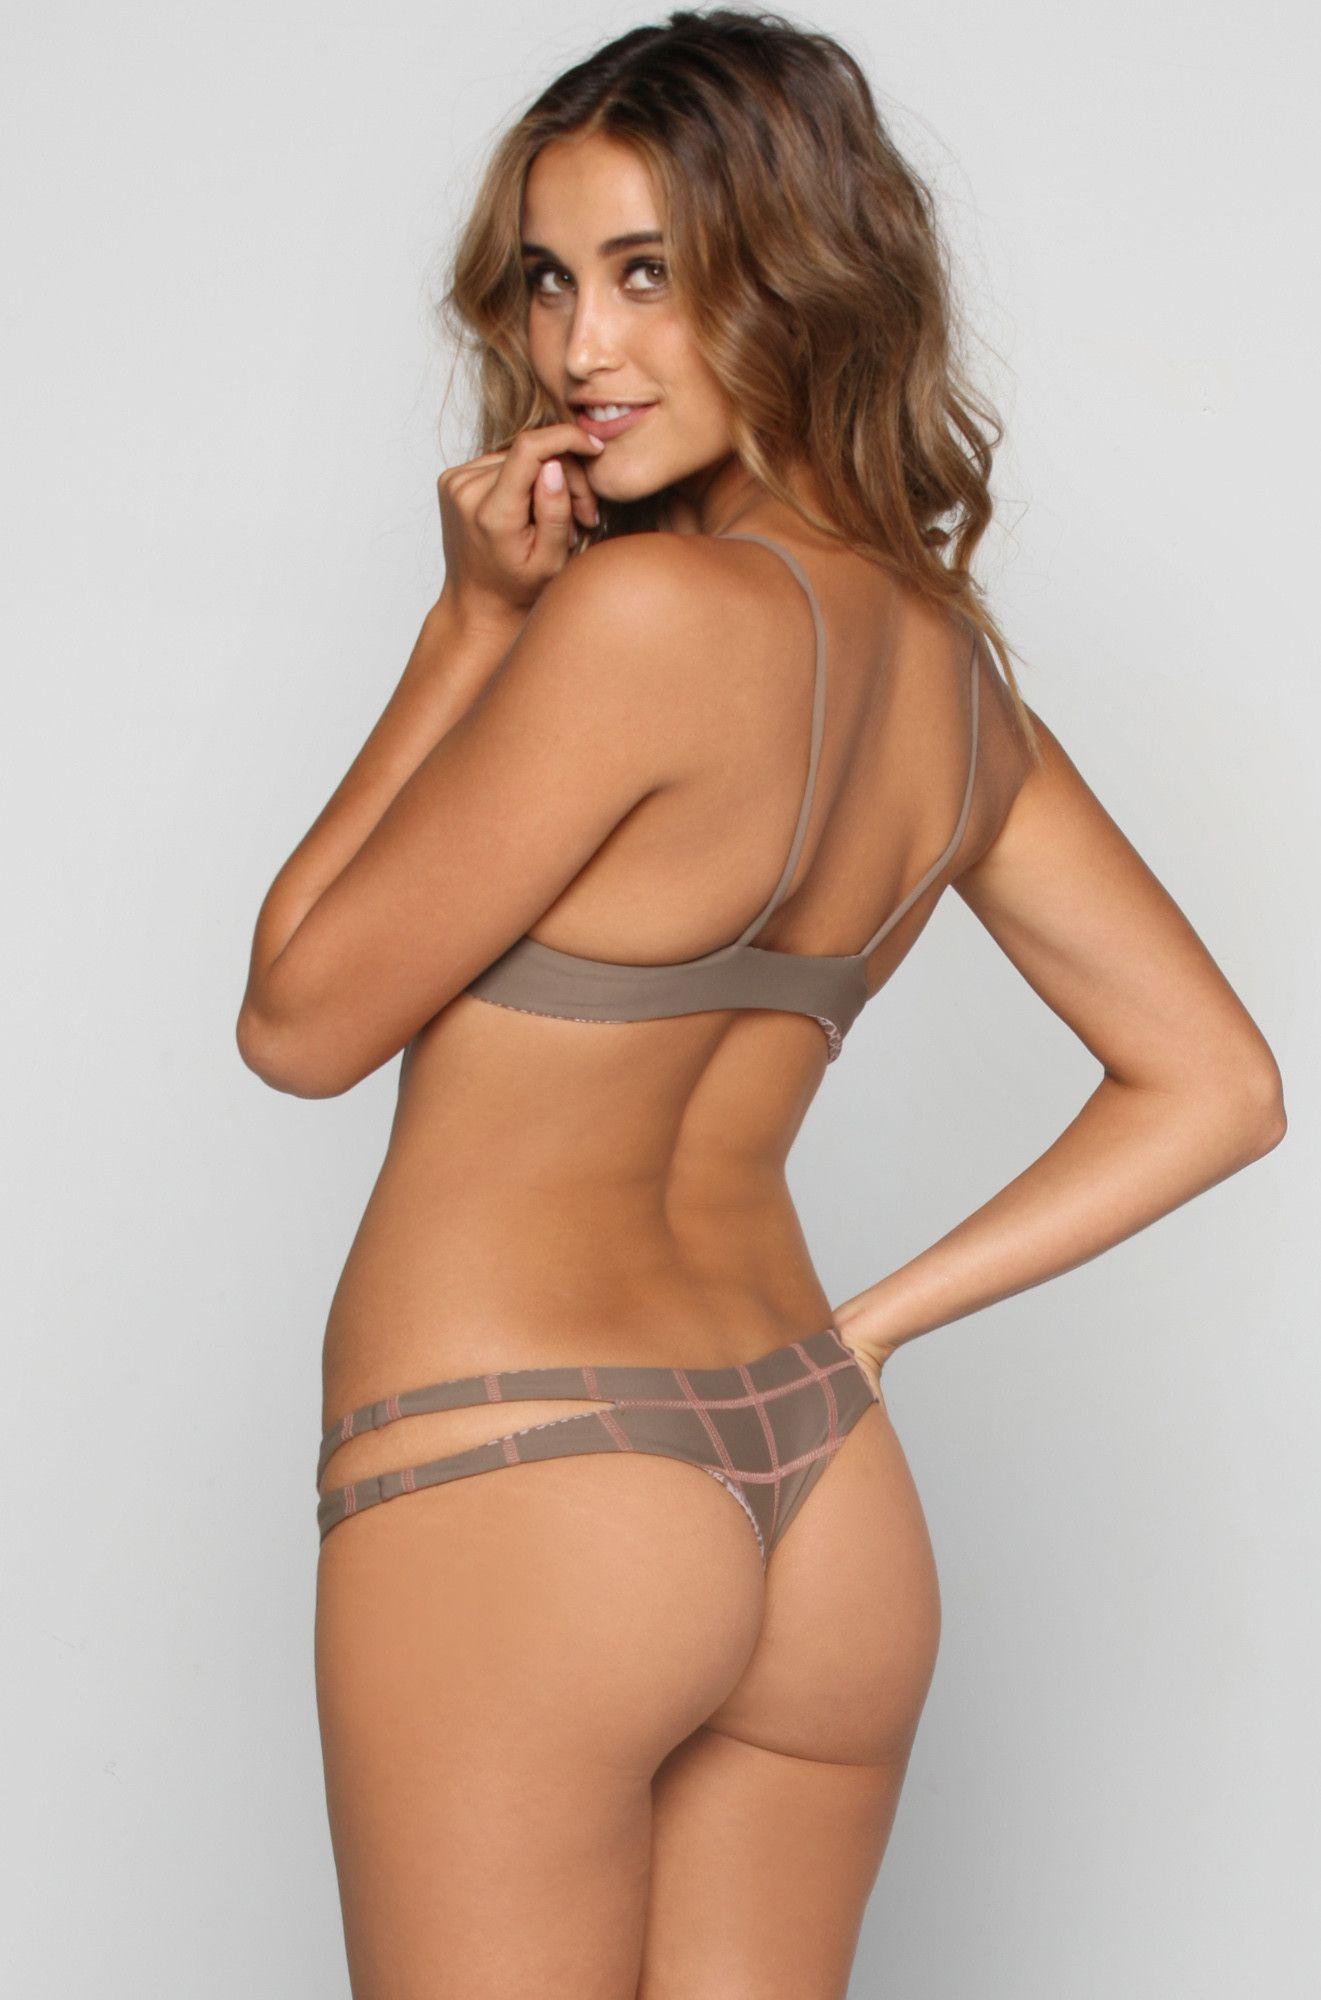 nude (98 photo), Sexy Celebrites pictures